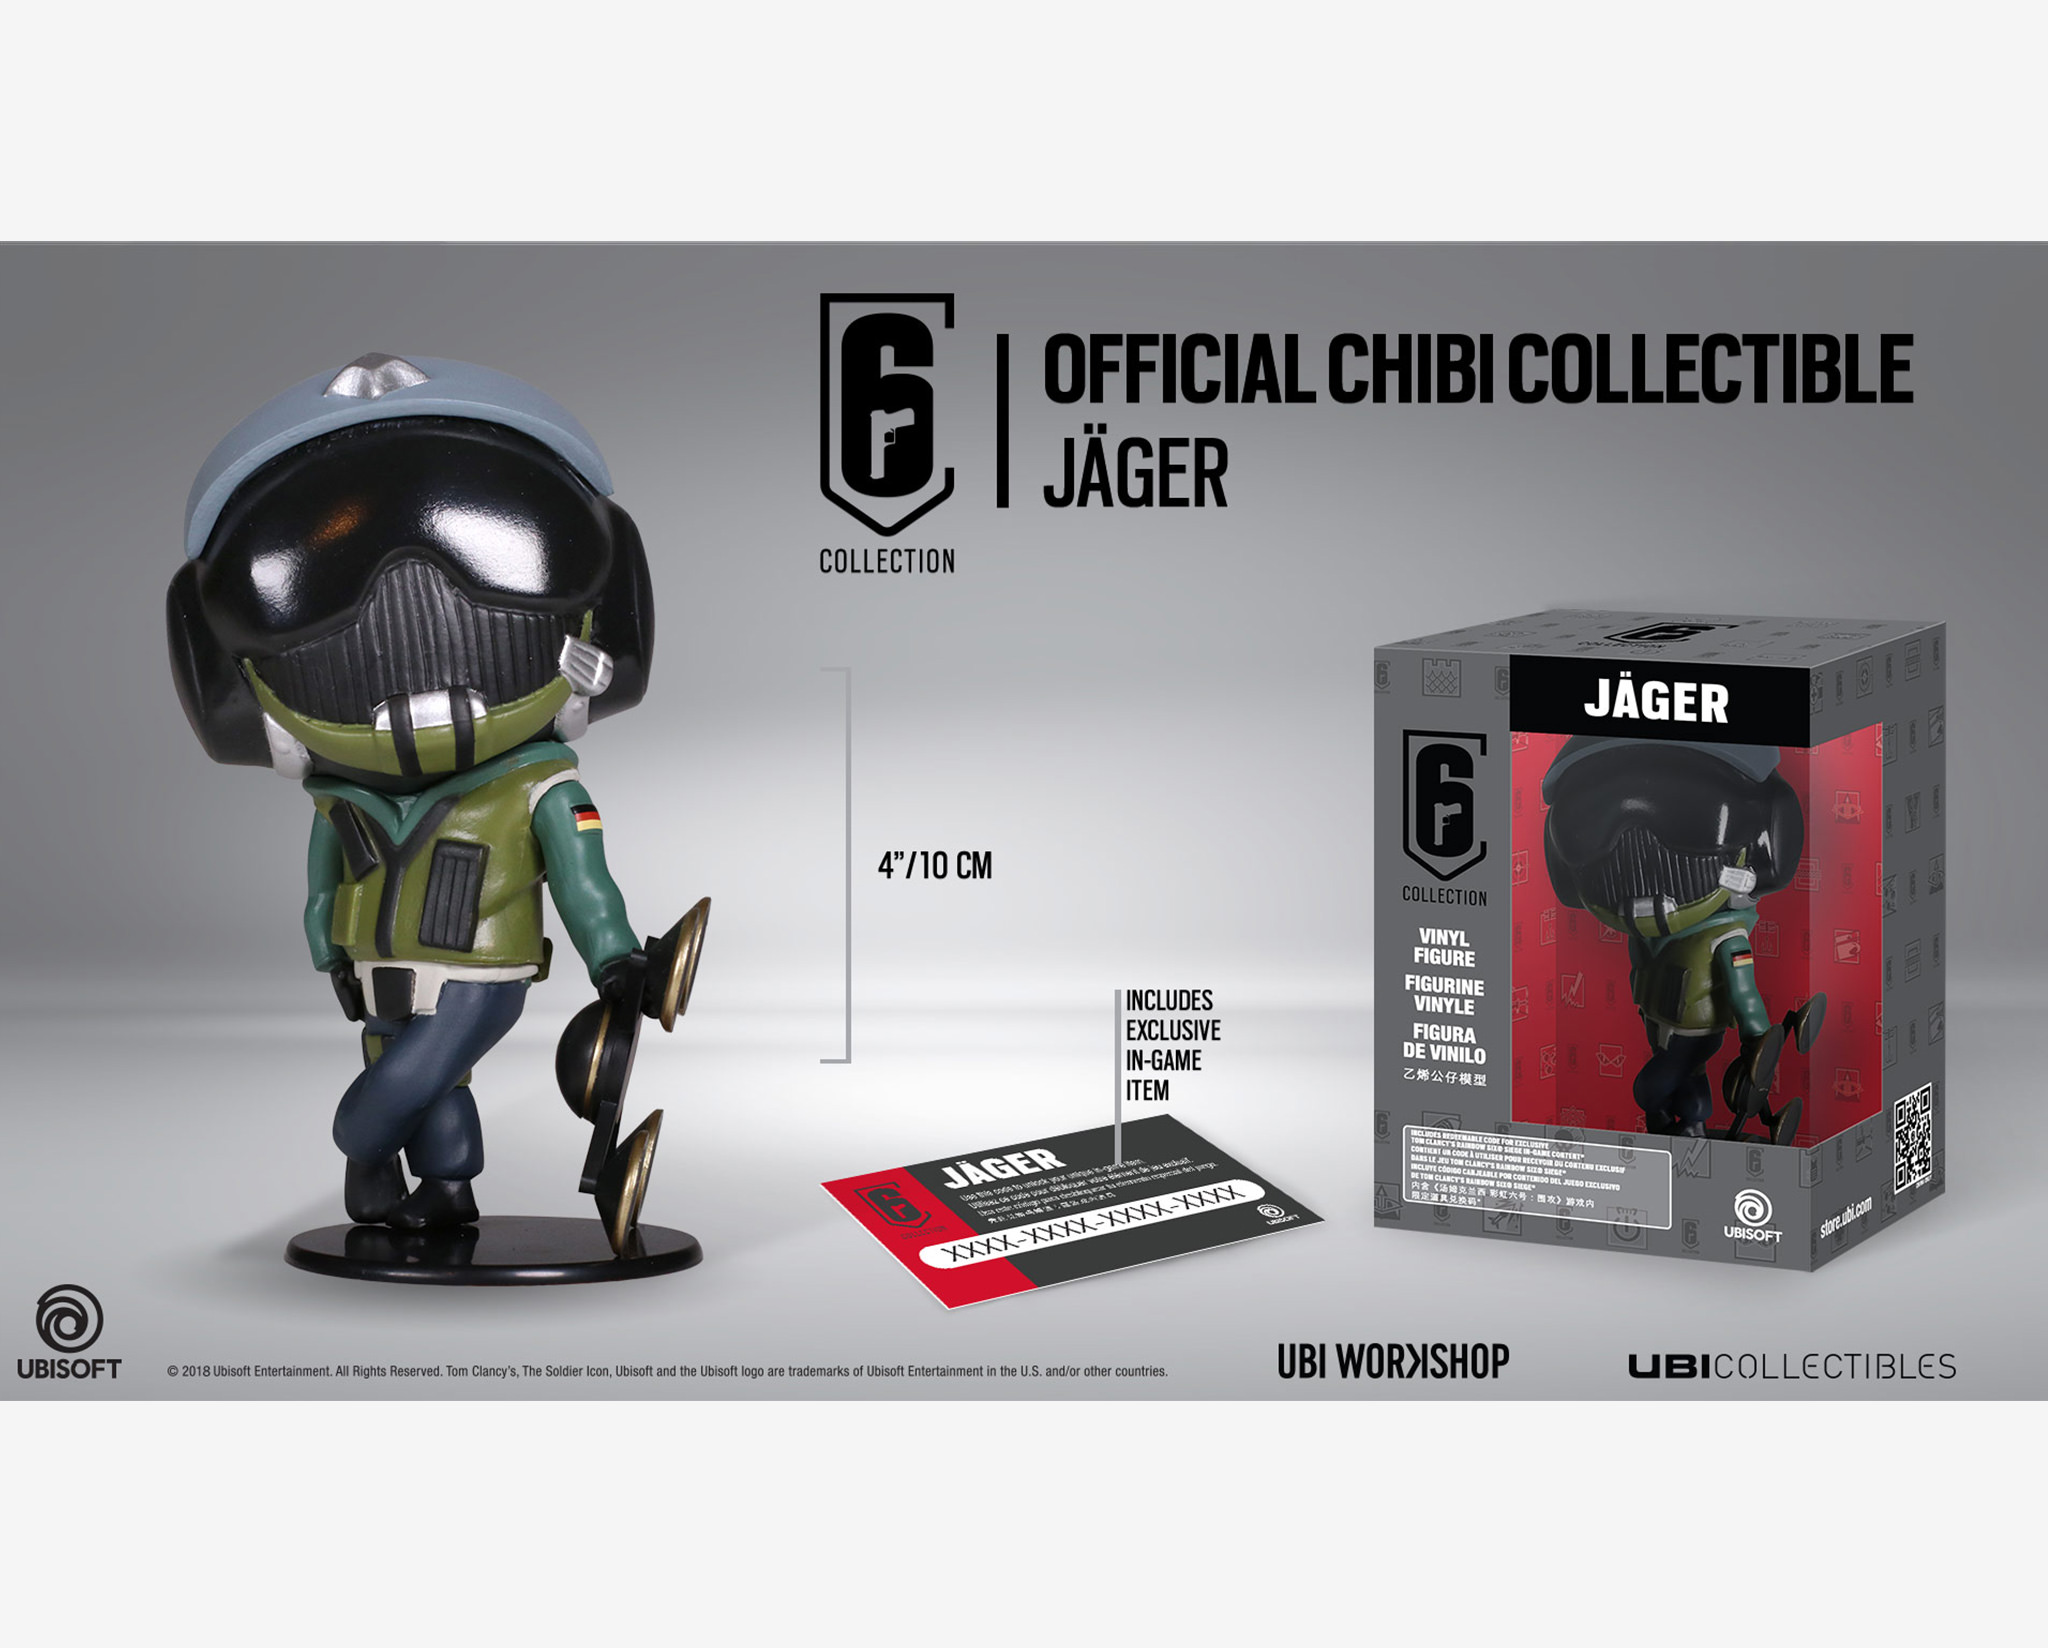 ubisoft chibi  Six collection – Jager Chibi Figurine